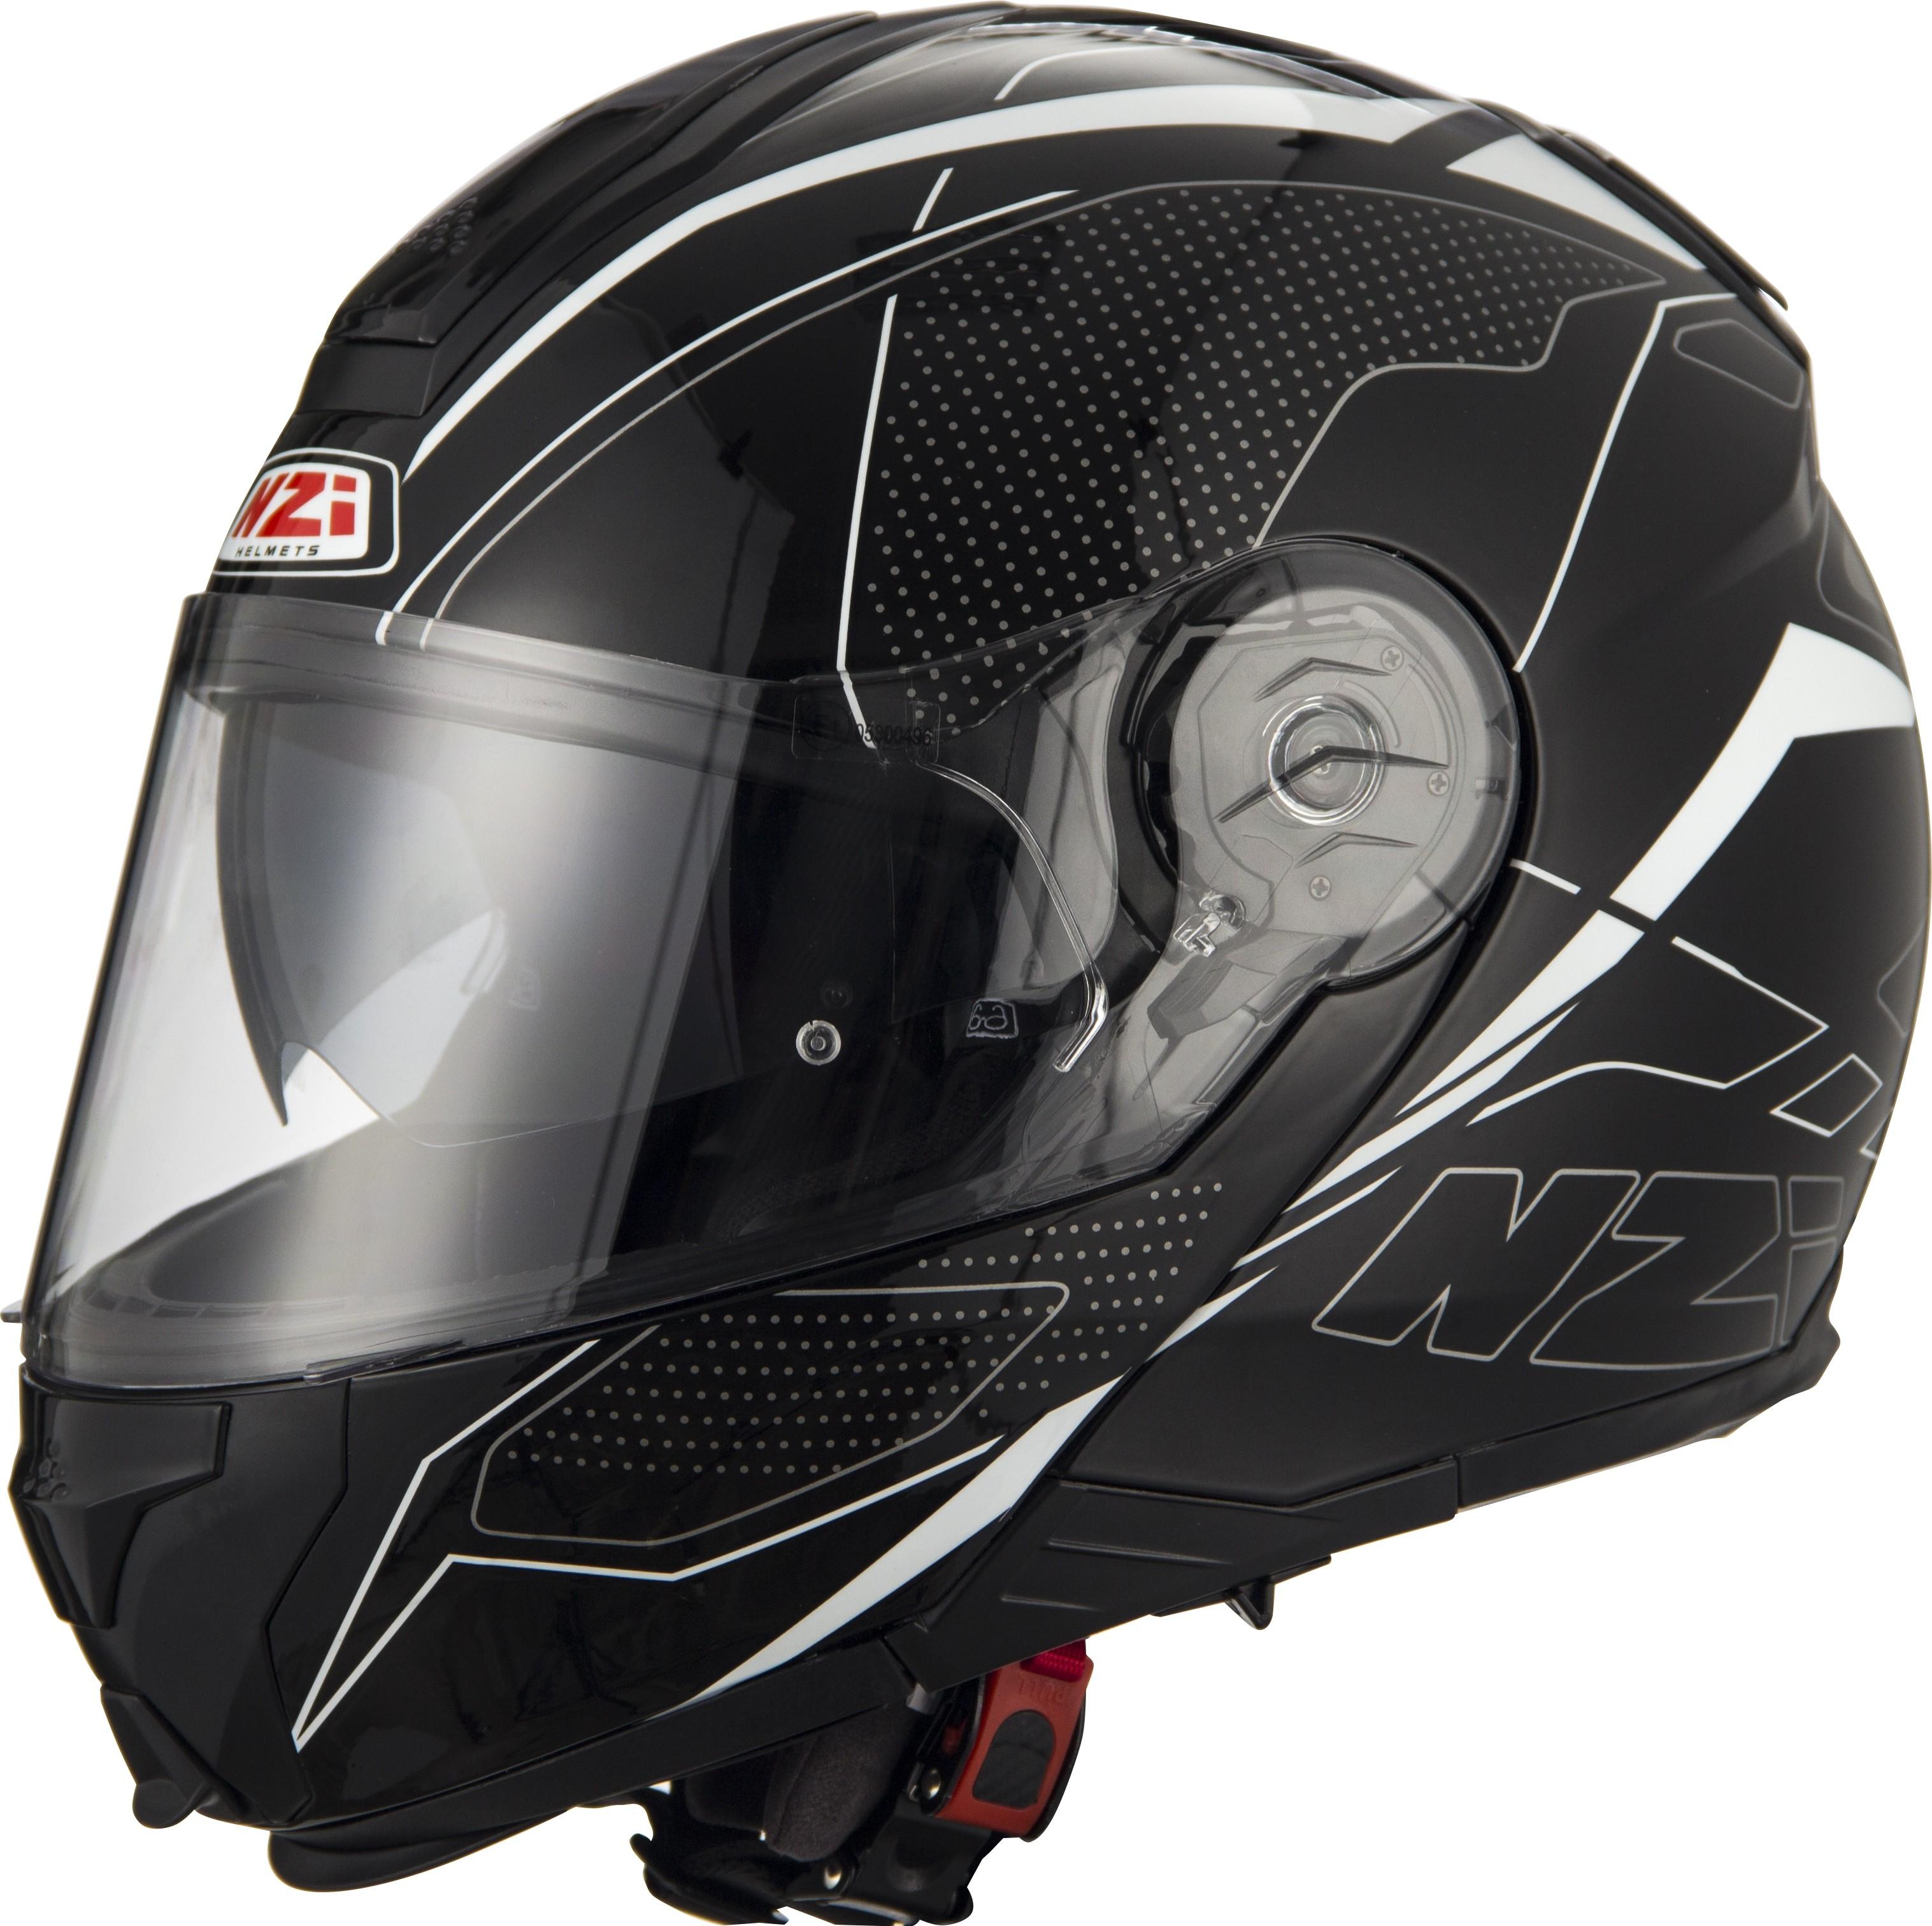 casco-nzi-combi2-duo-graphics-visor-sword-negro-blanco-brillo-150299a050